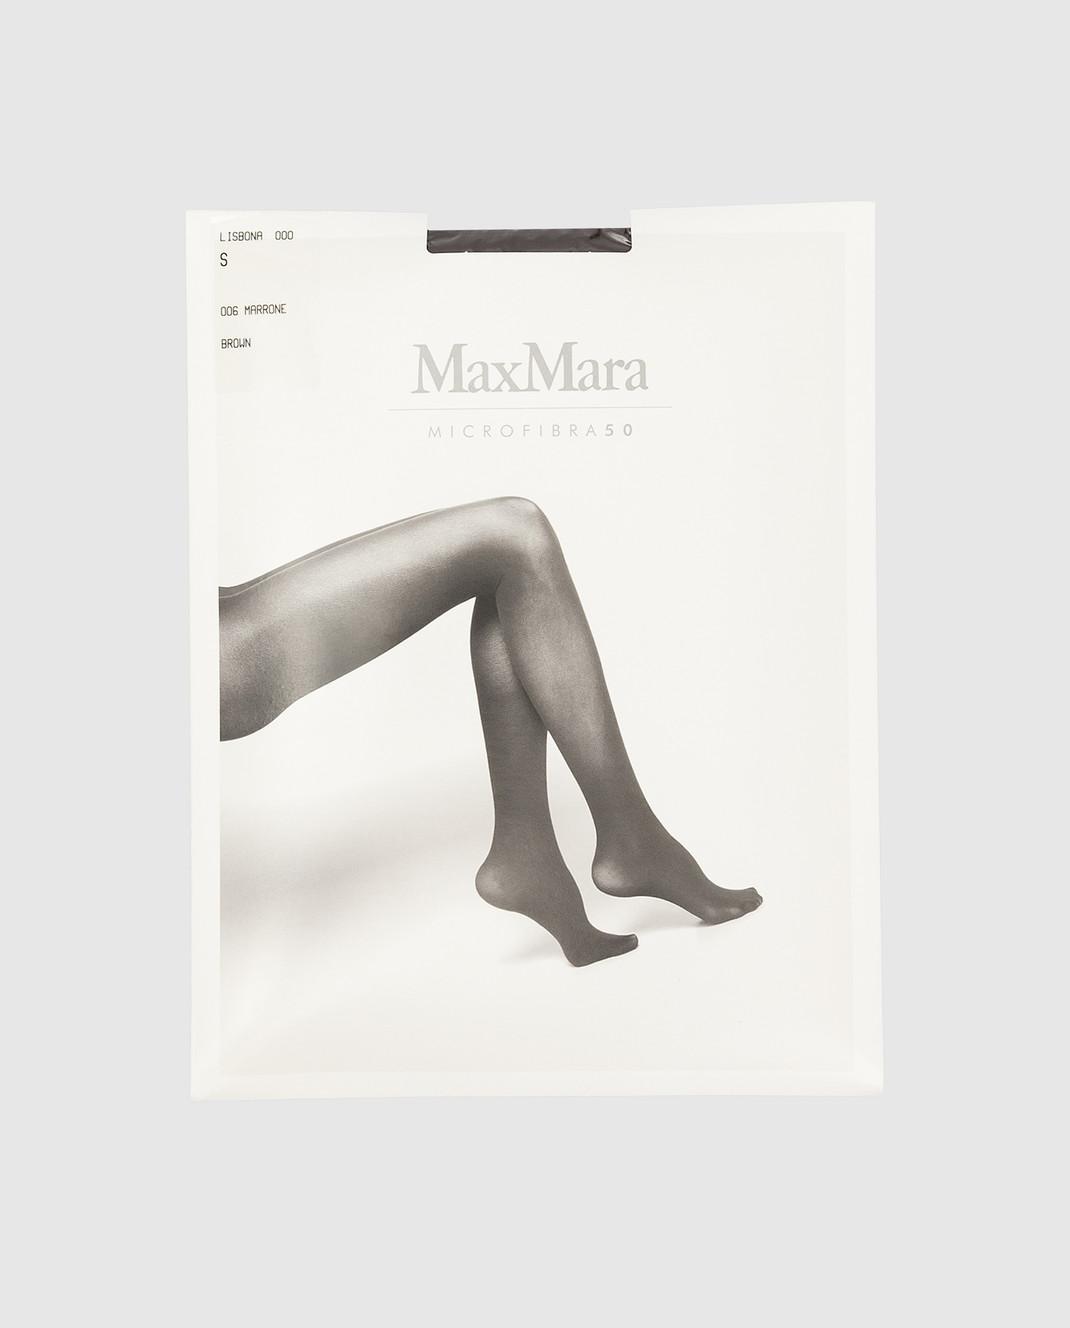 Max Mara Темно-коричневые колготы 50 ден изображение 1